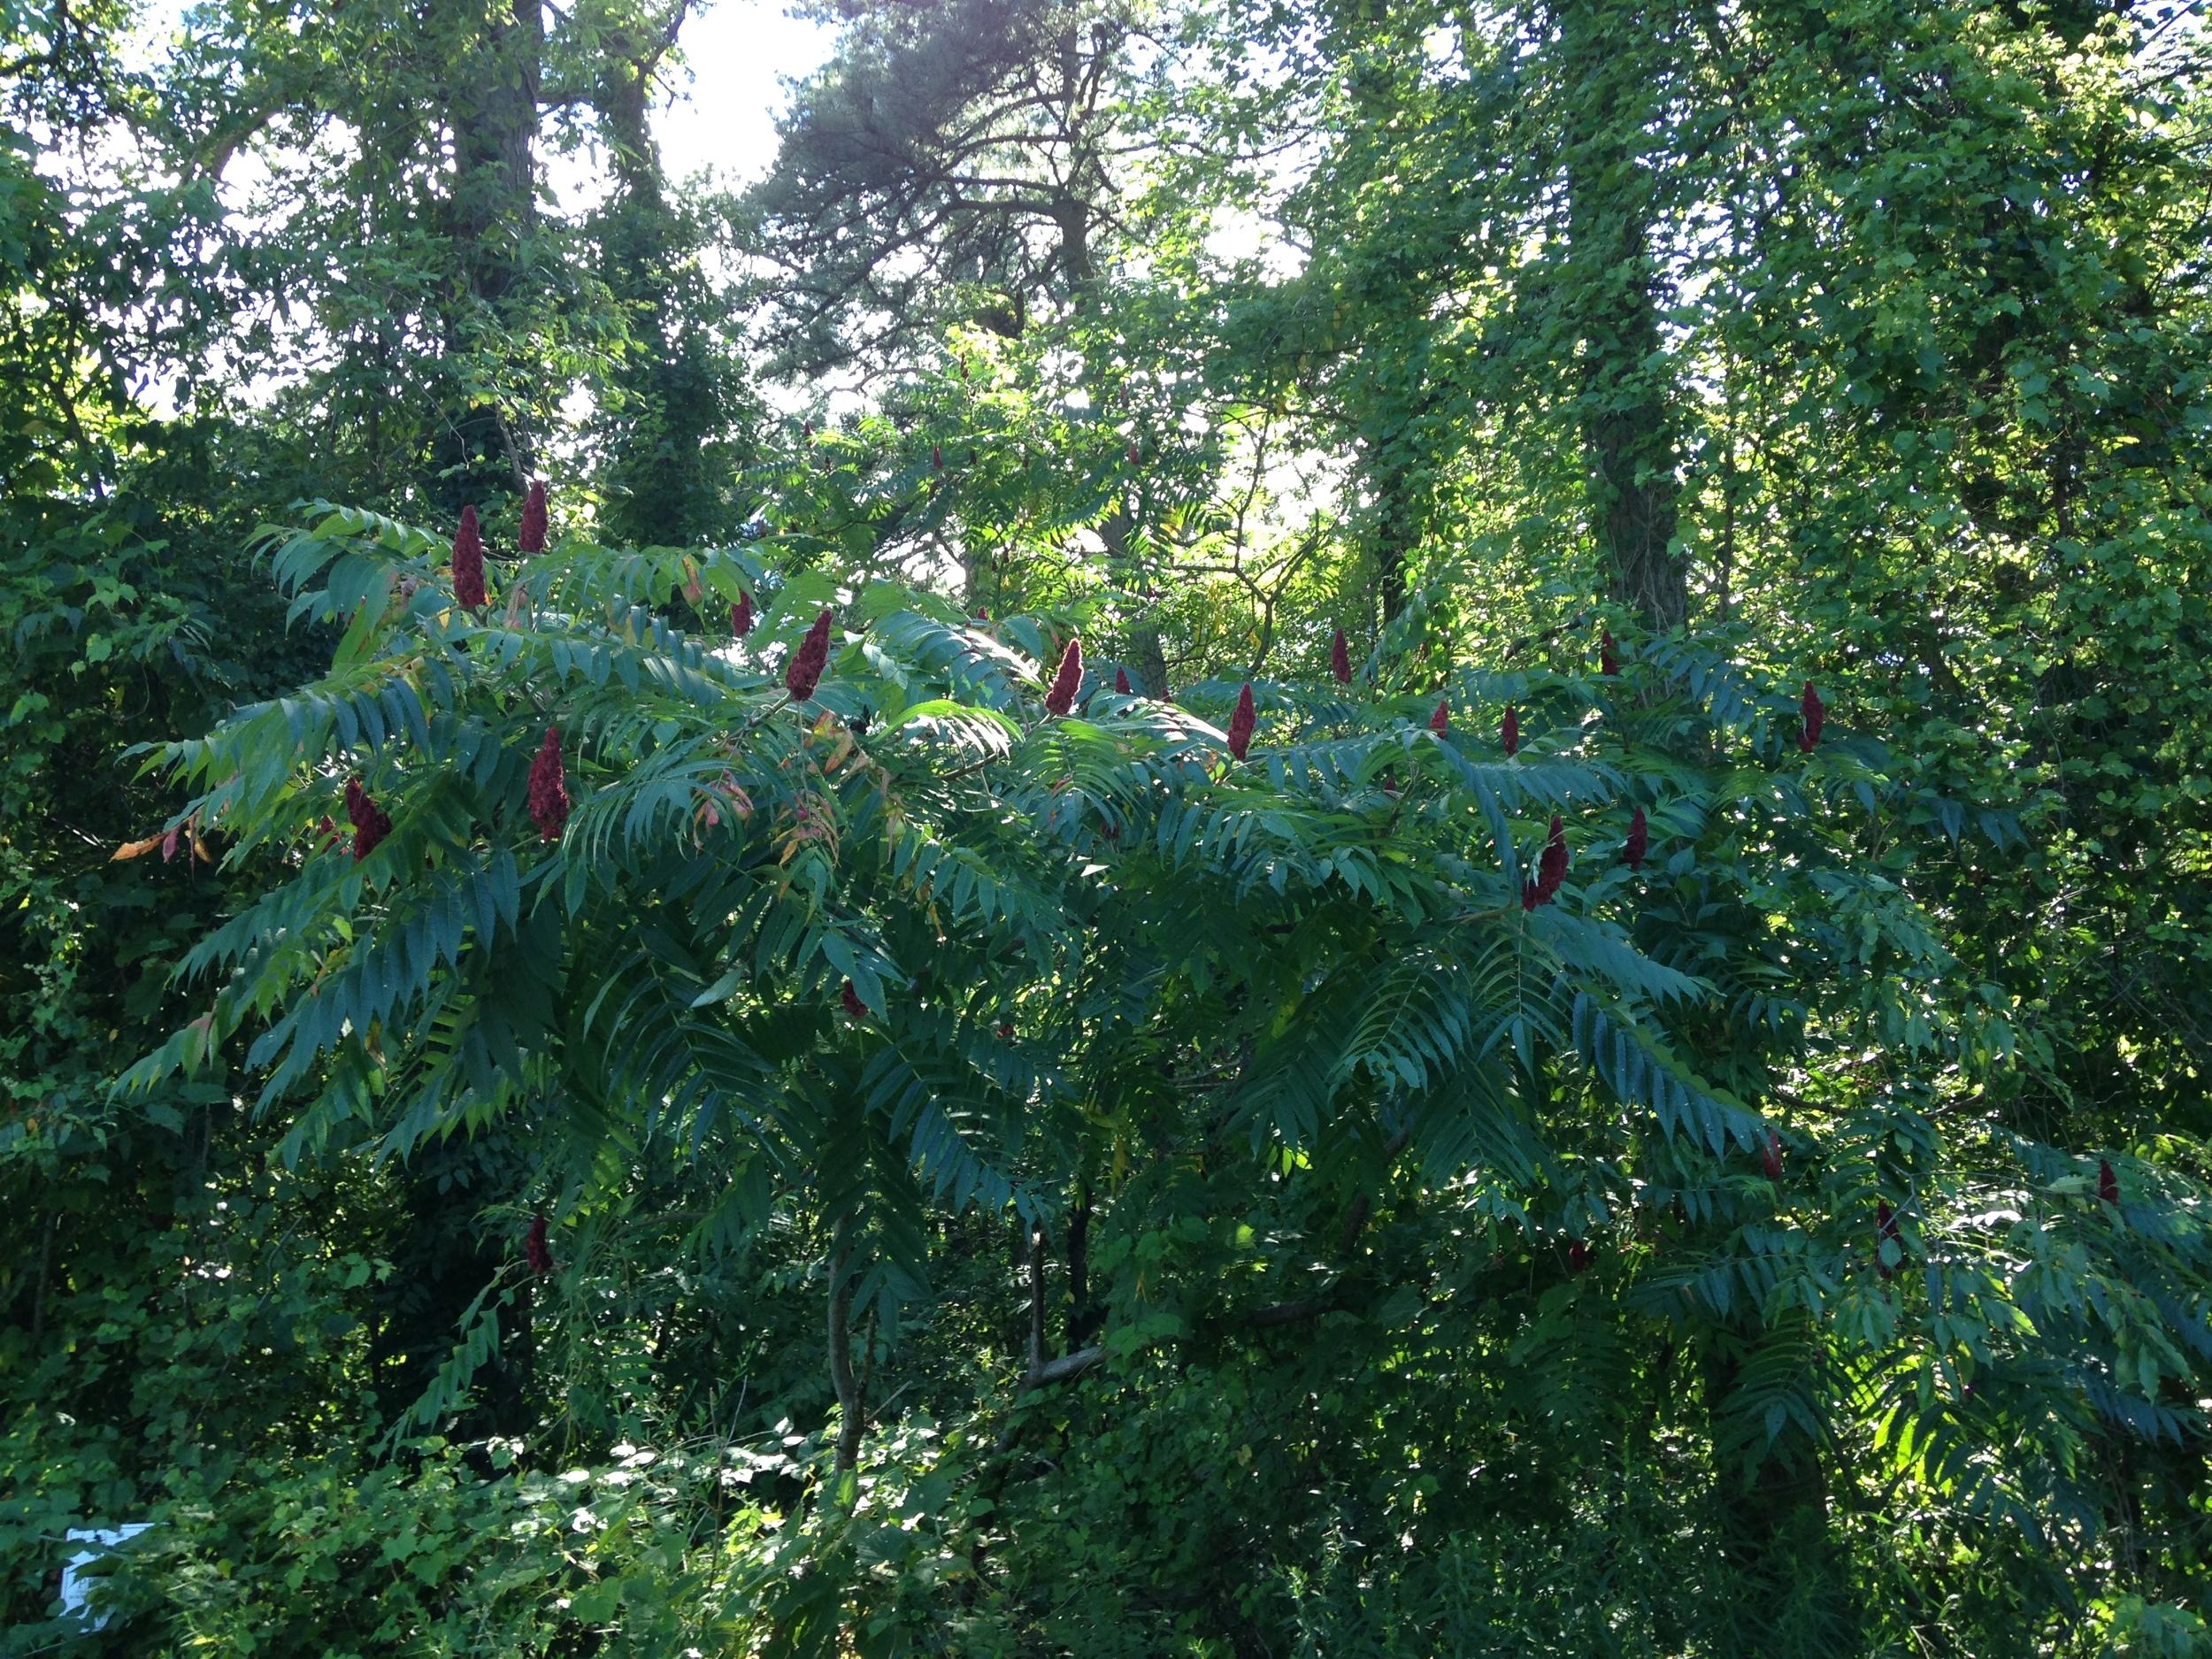 Ran a 5K in the Pine Bush.